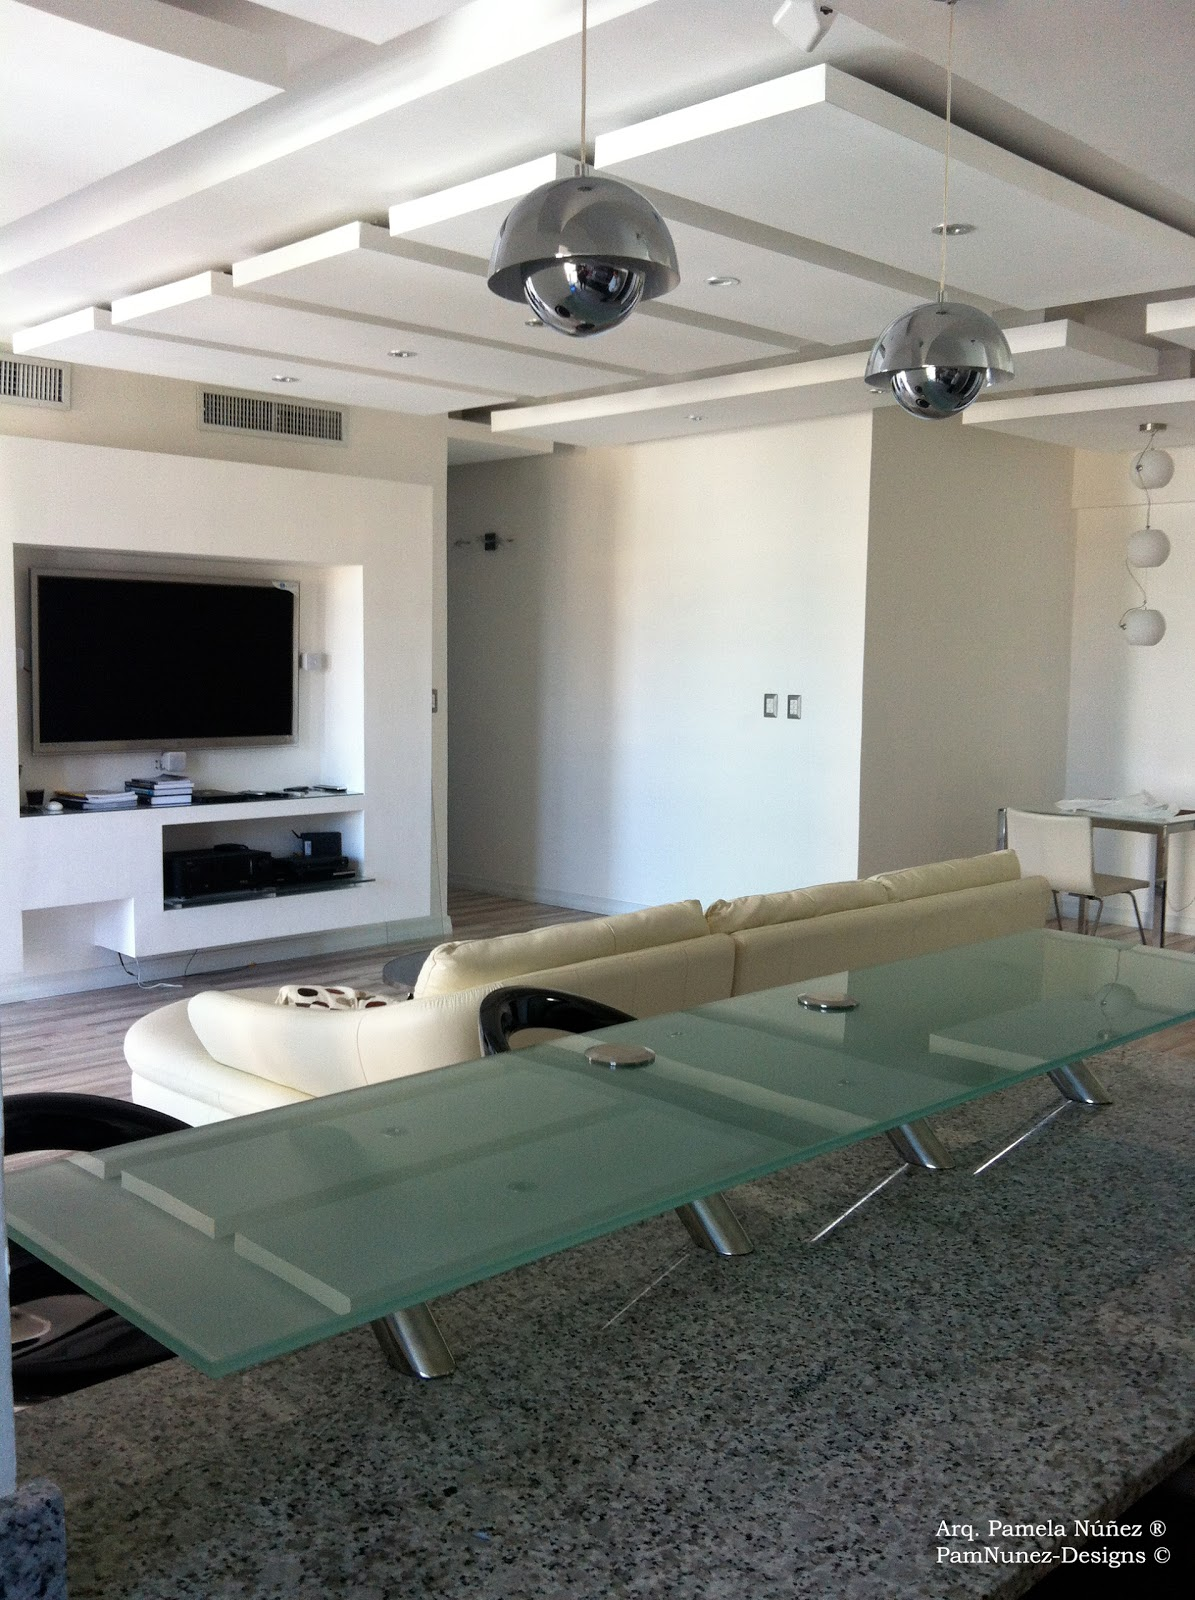 Pamnunez designs remodelaci n apartamento para soltero for Diseno de apartamento de soltero